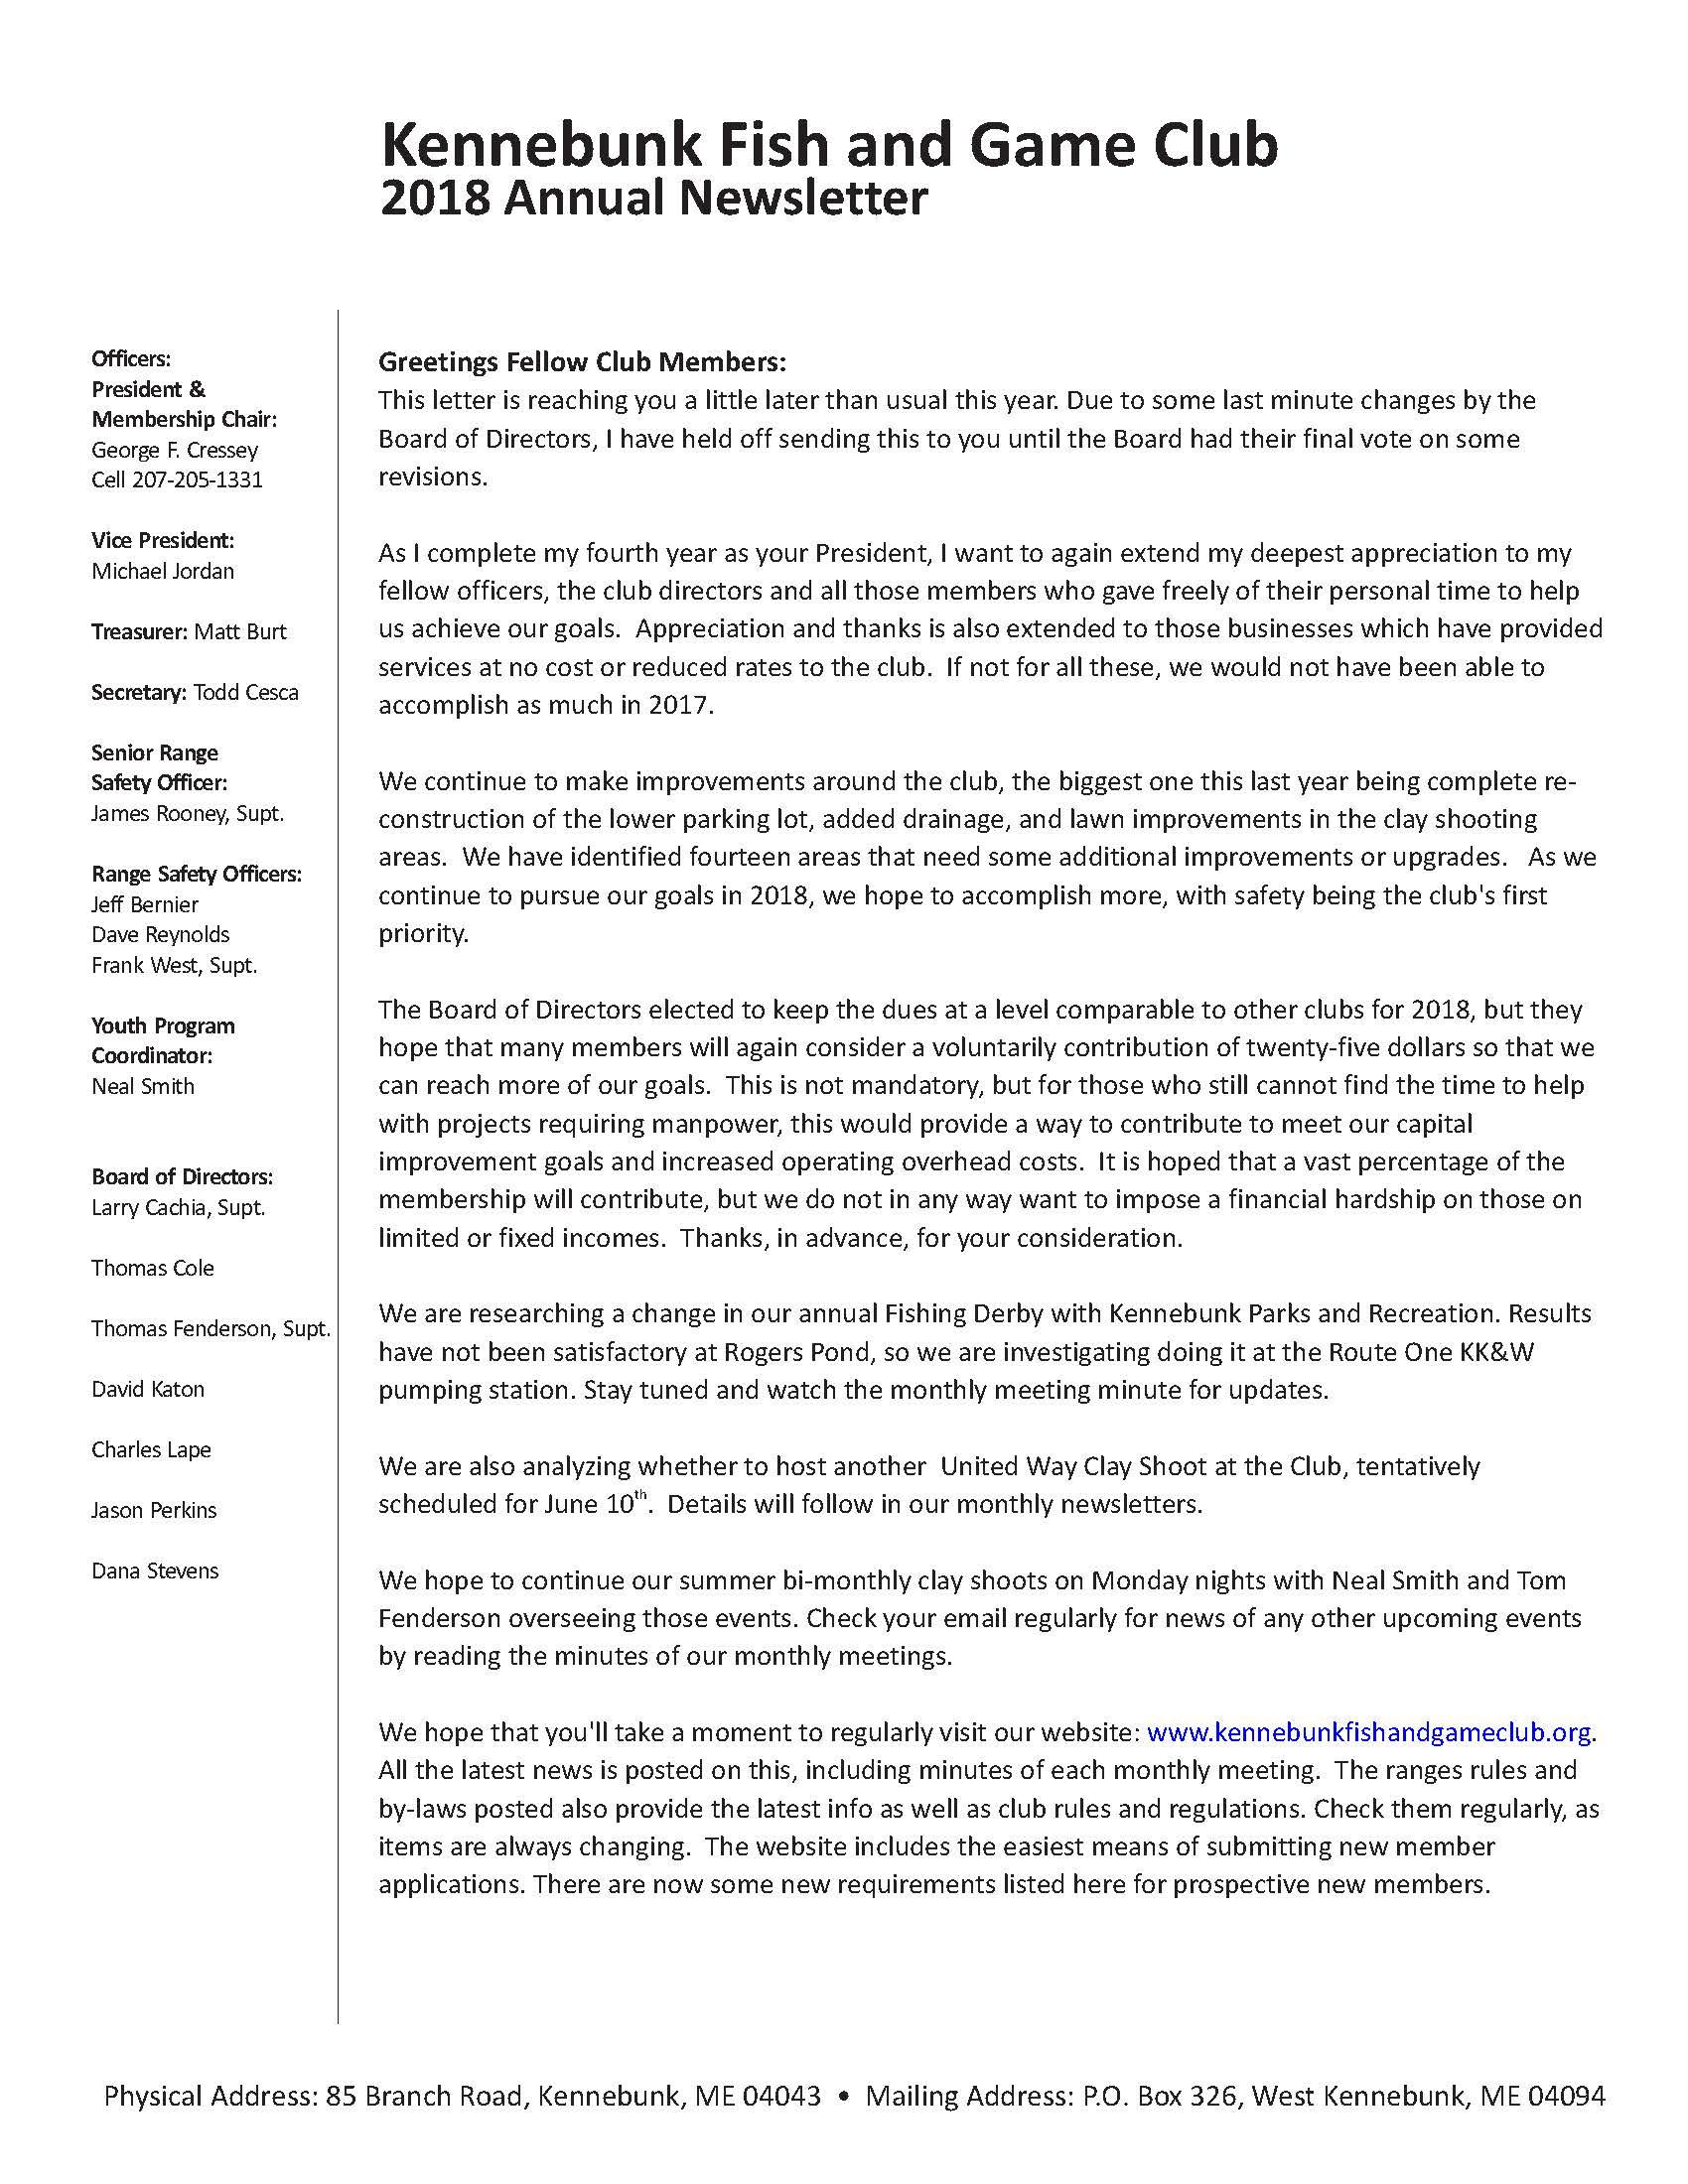 Kennebunk Fish & Game 2018  Newsletter 021218_Page_1.jpg